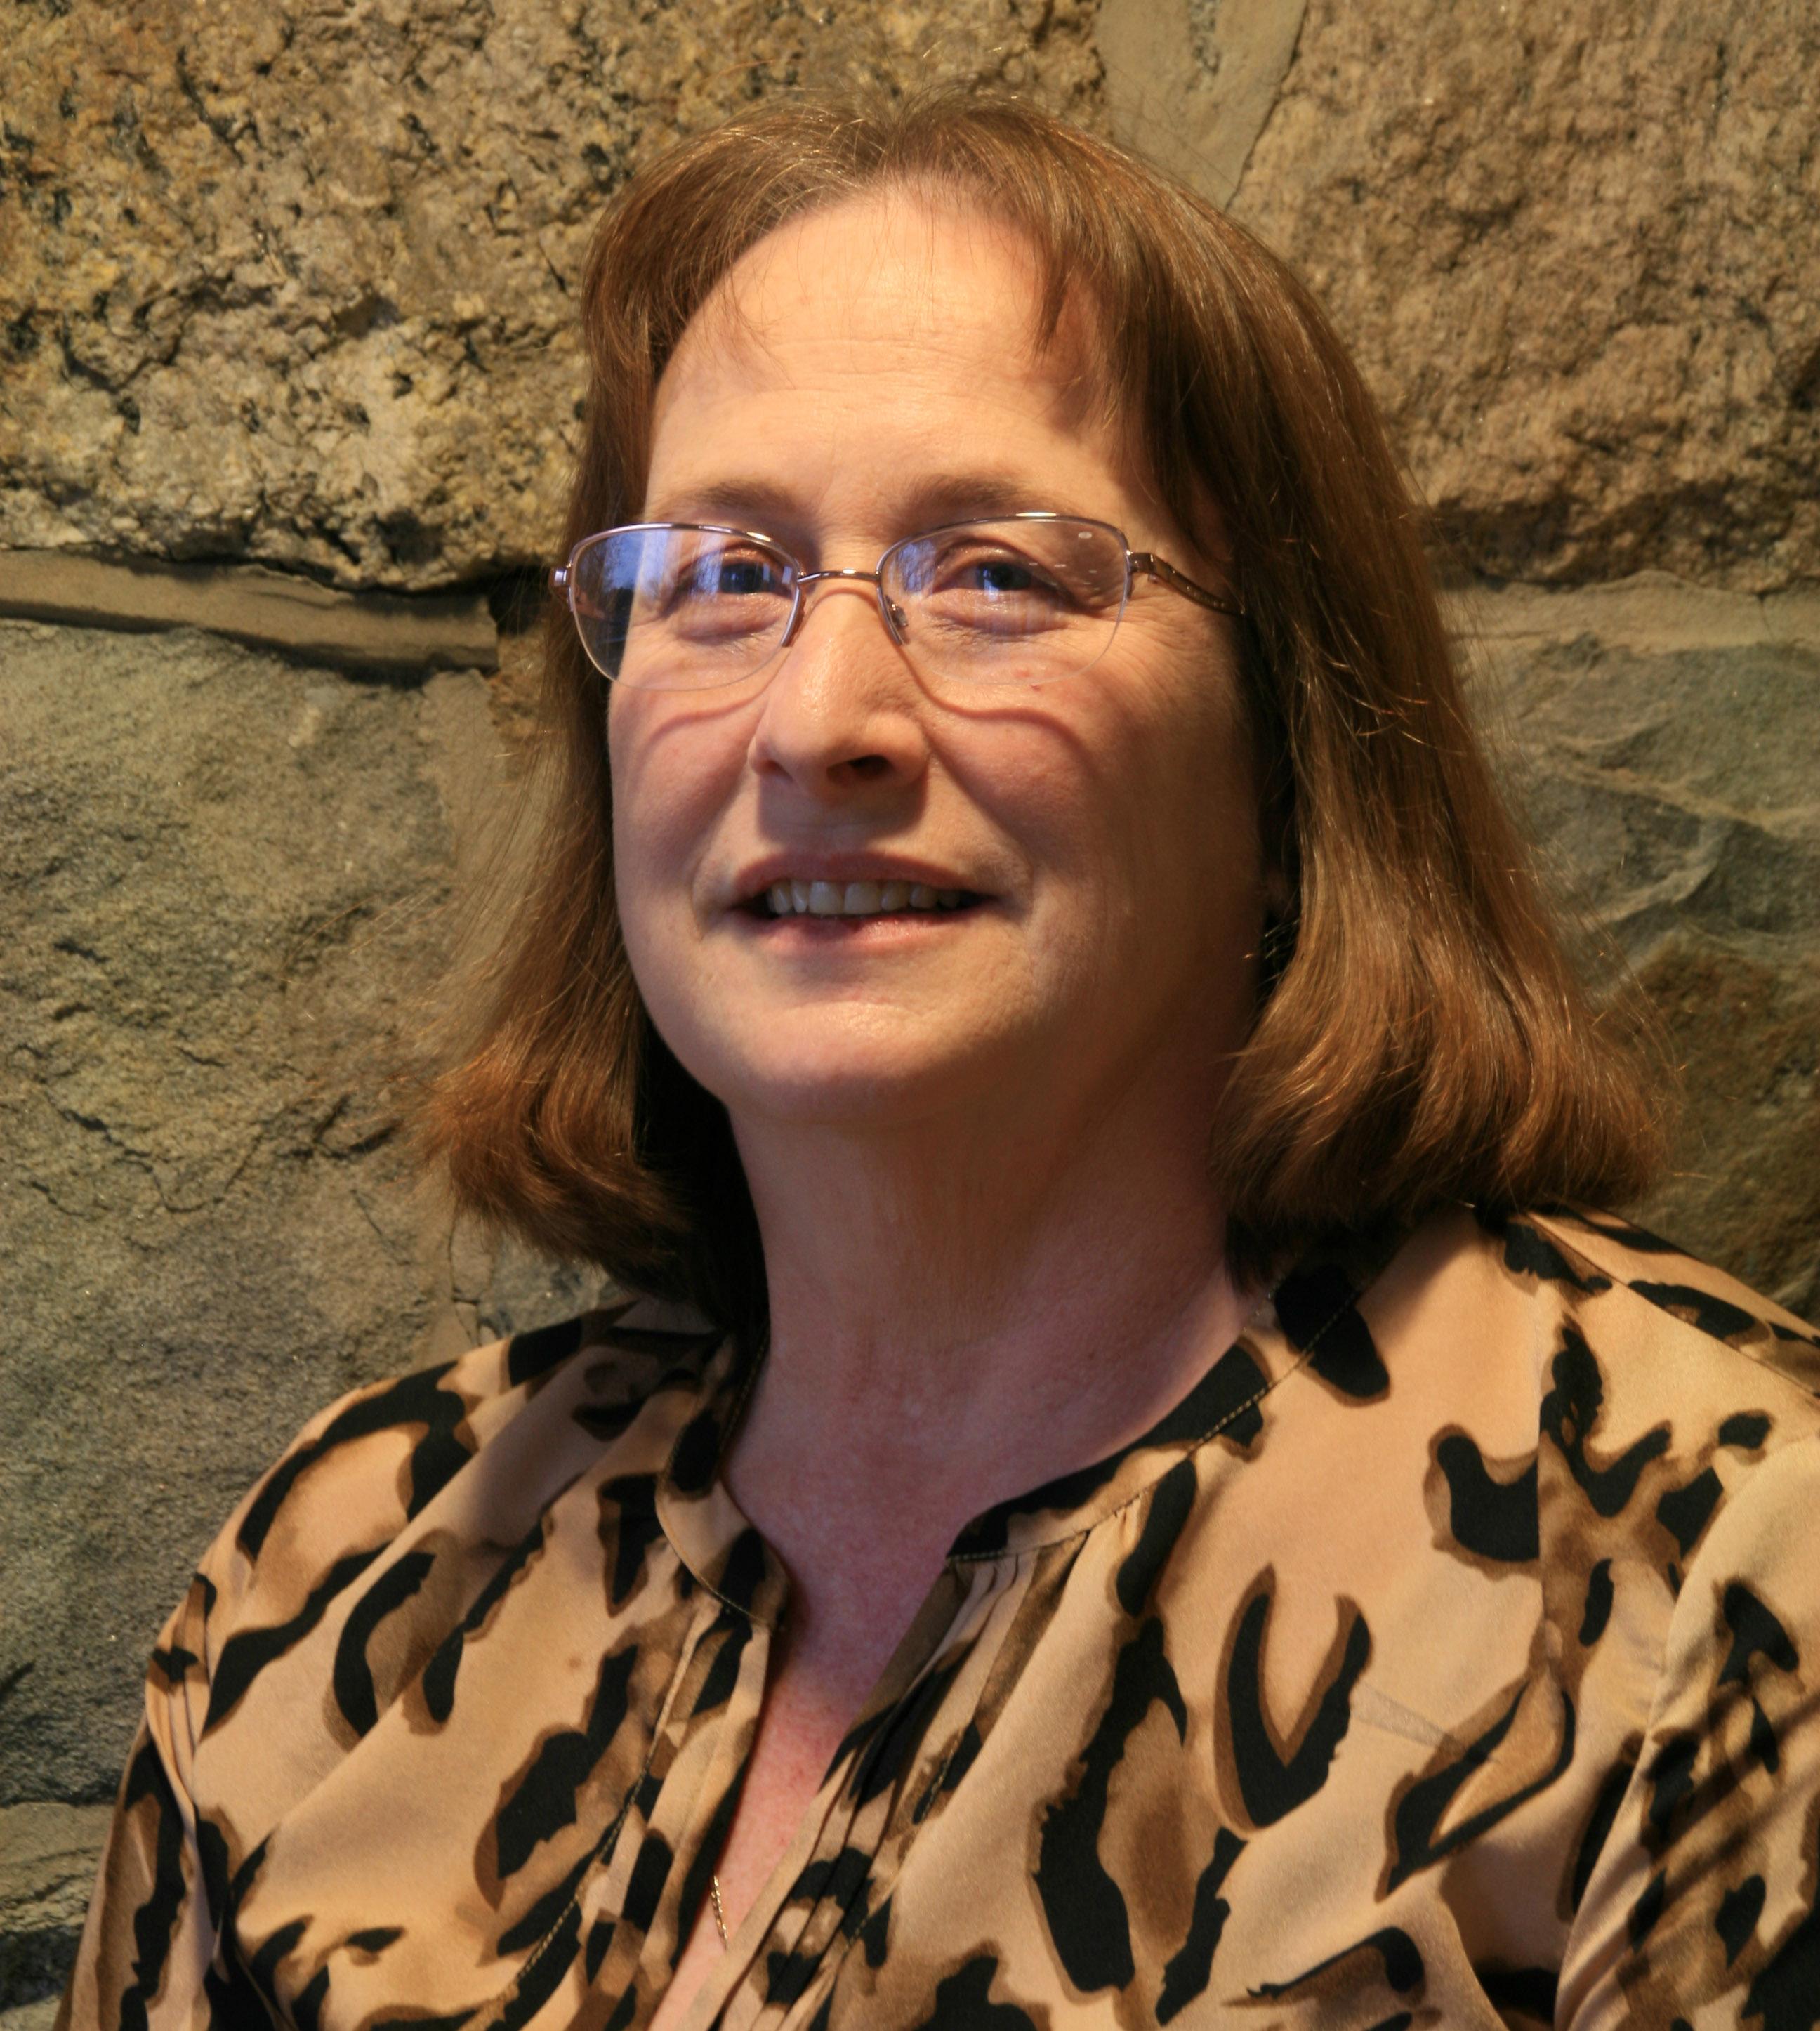 Rhode Island Insurance Commissioner Elizabeth Keller Dwyer